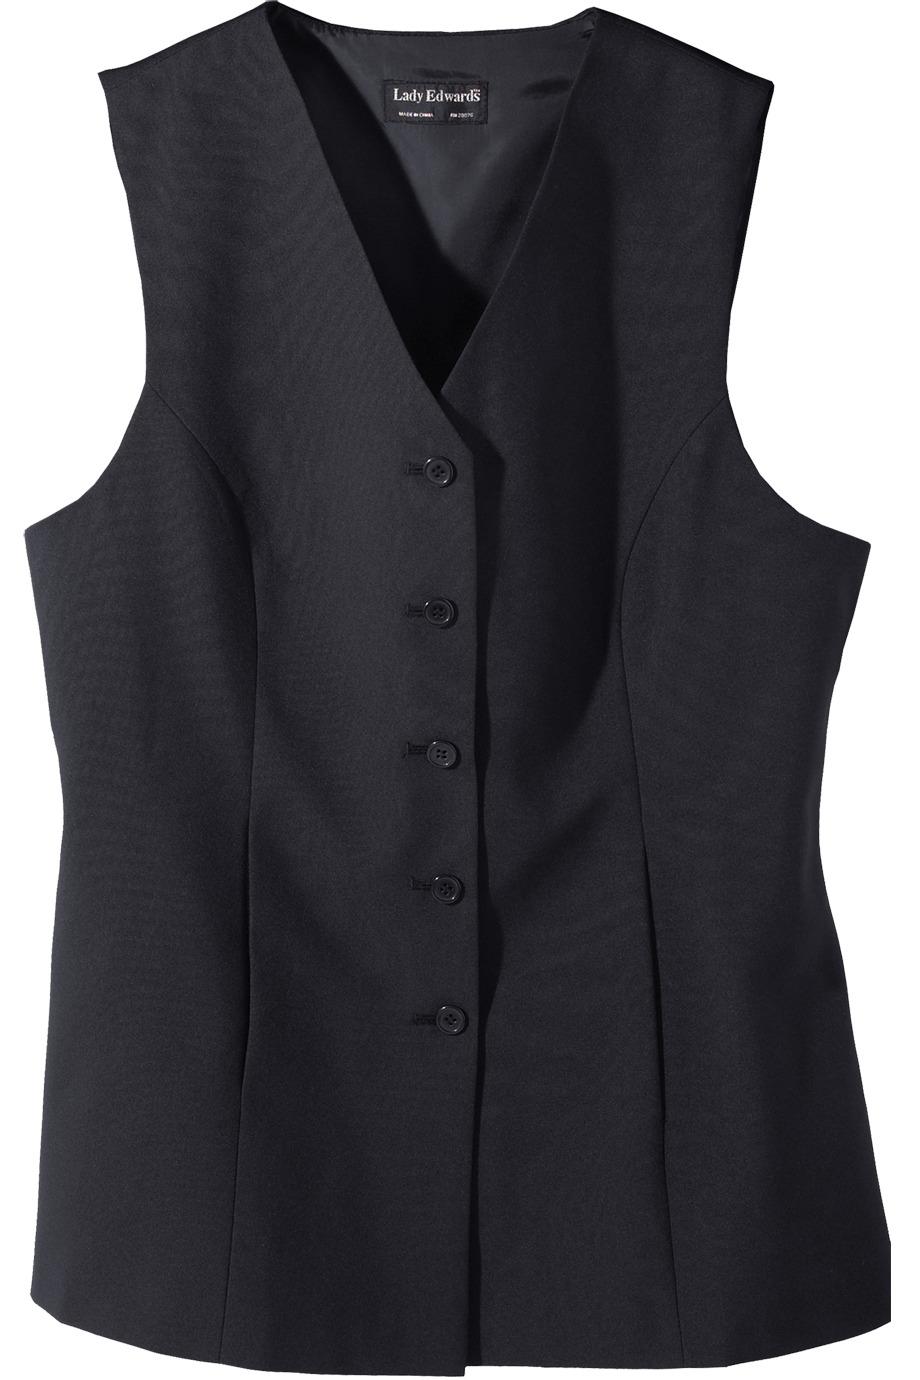 Edwards Garment 7270 - Women's Tunic Vest